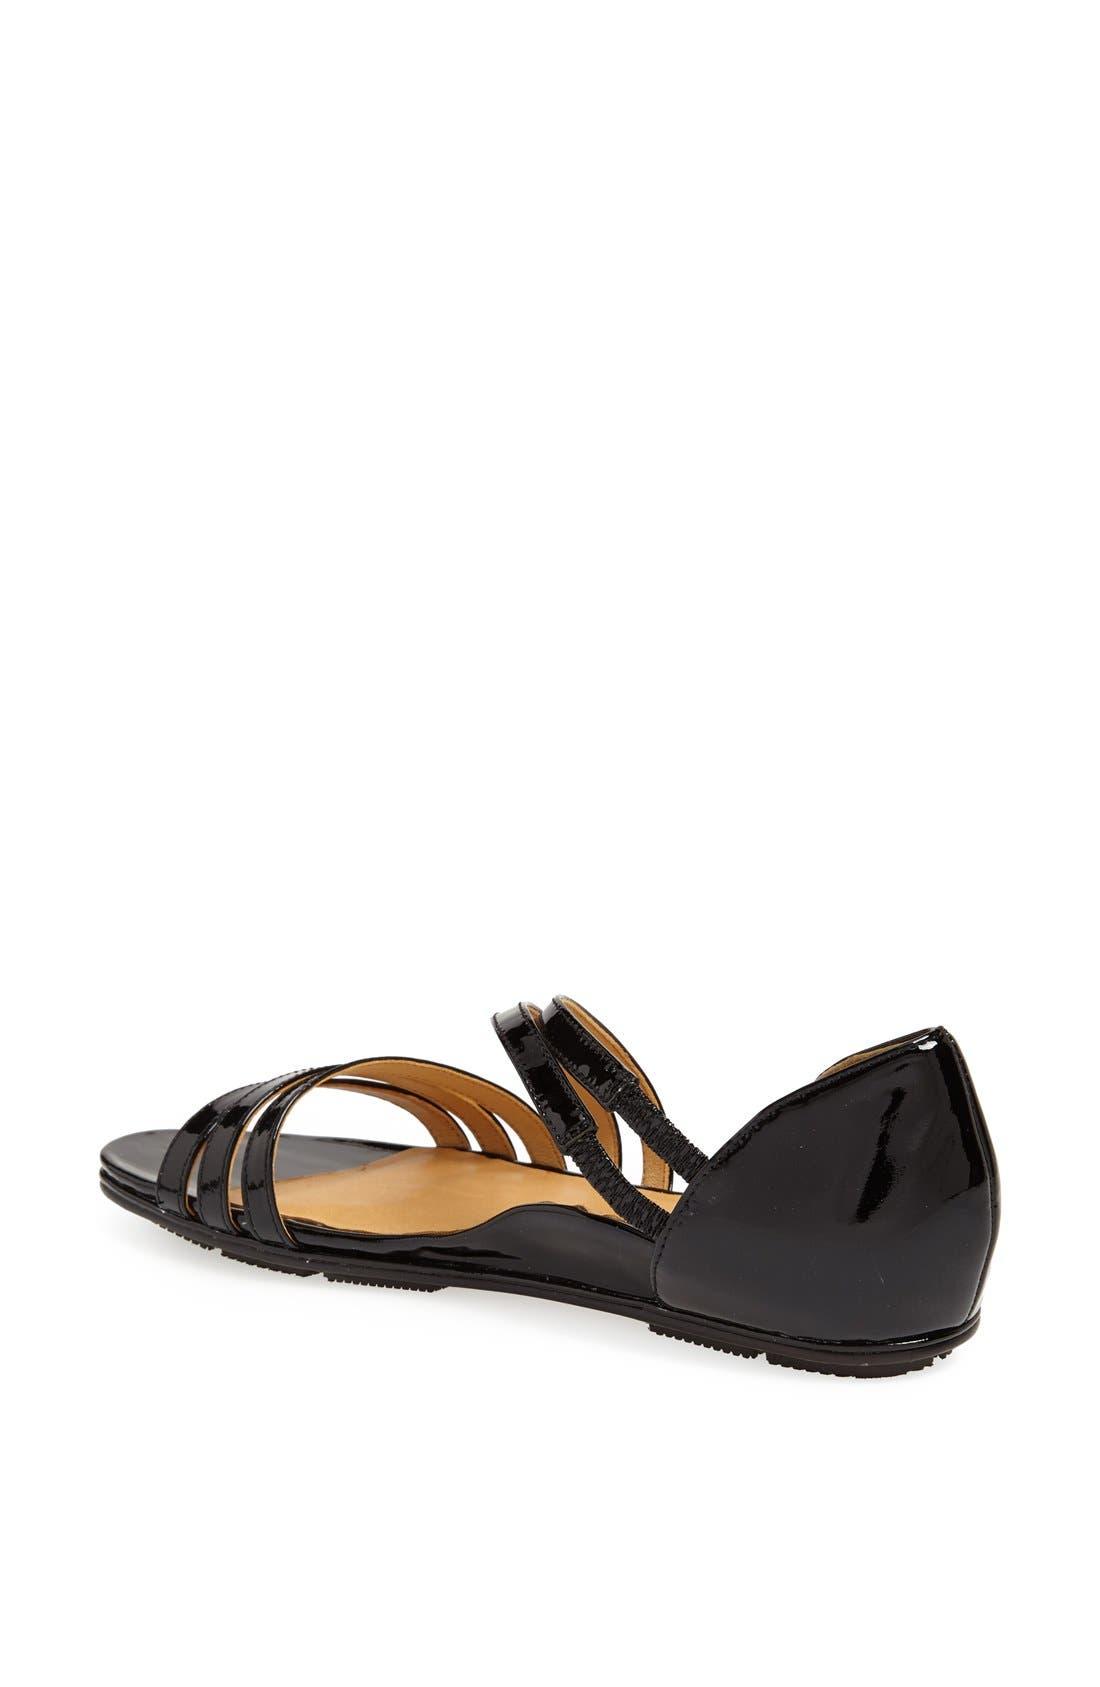 Alternate Image 2  - L'Amour des Pieds'Dolce' Sandal